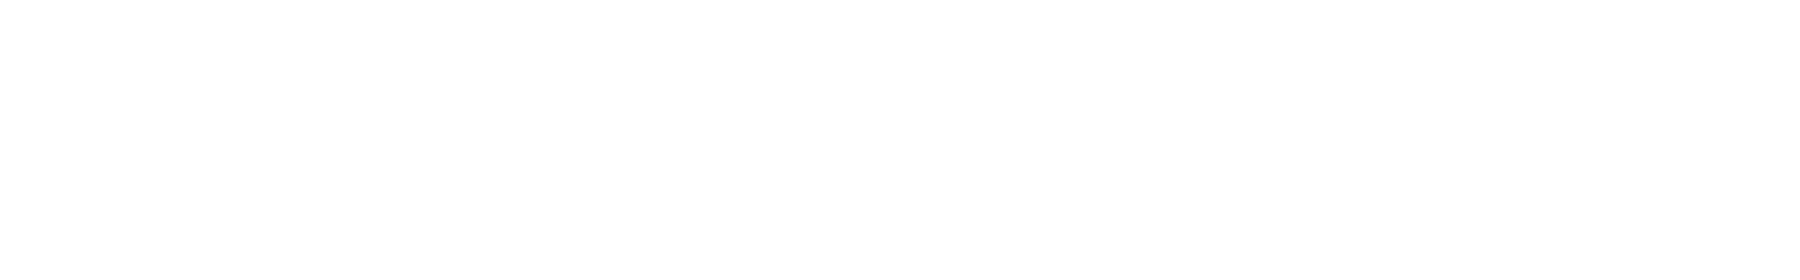 19130bpm